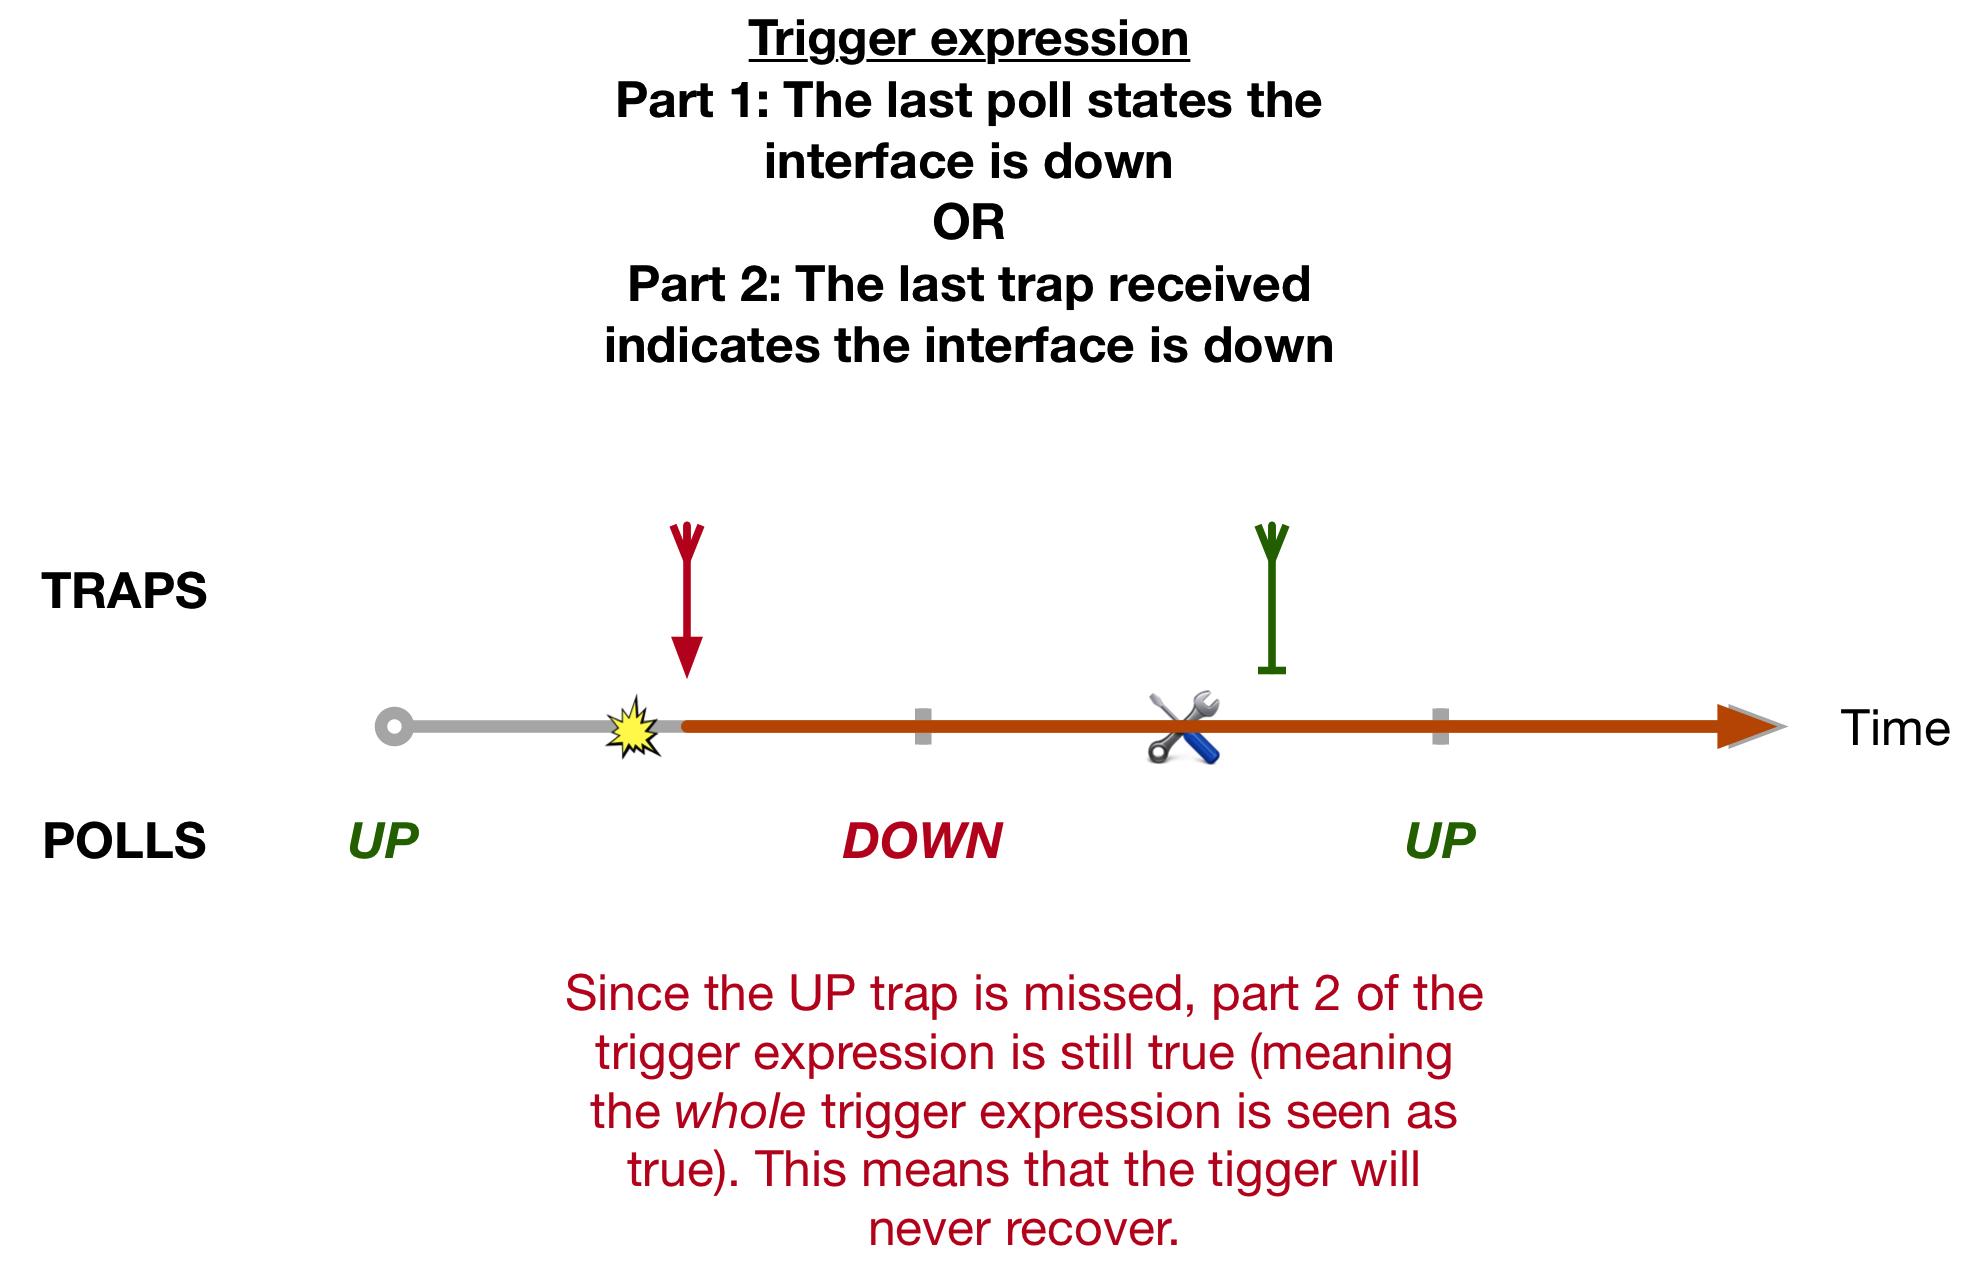 blog8_image9_diagram4